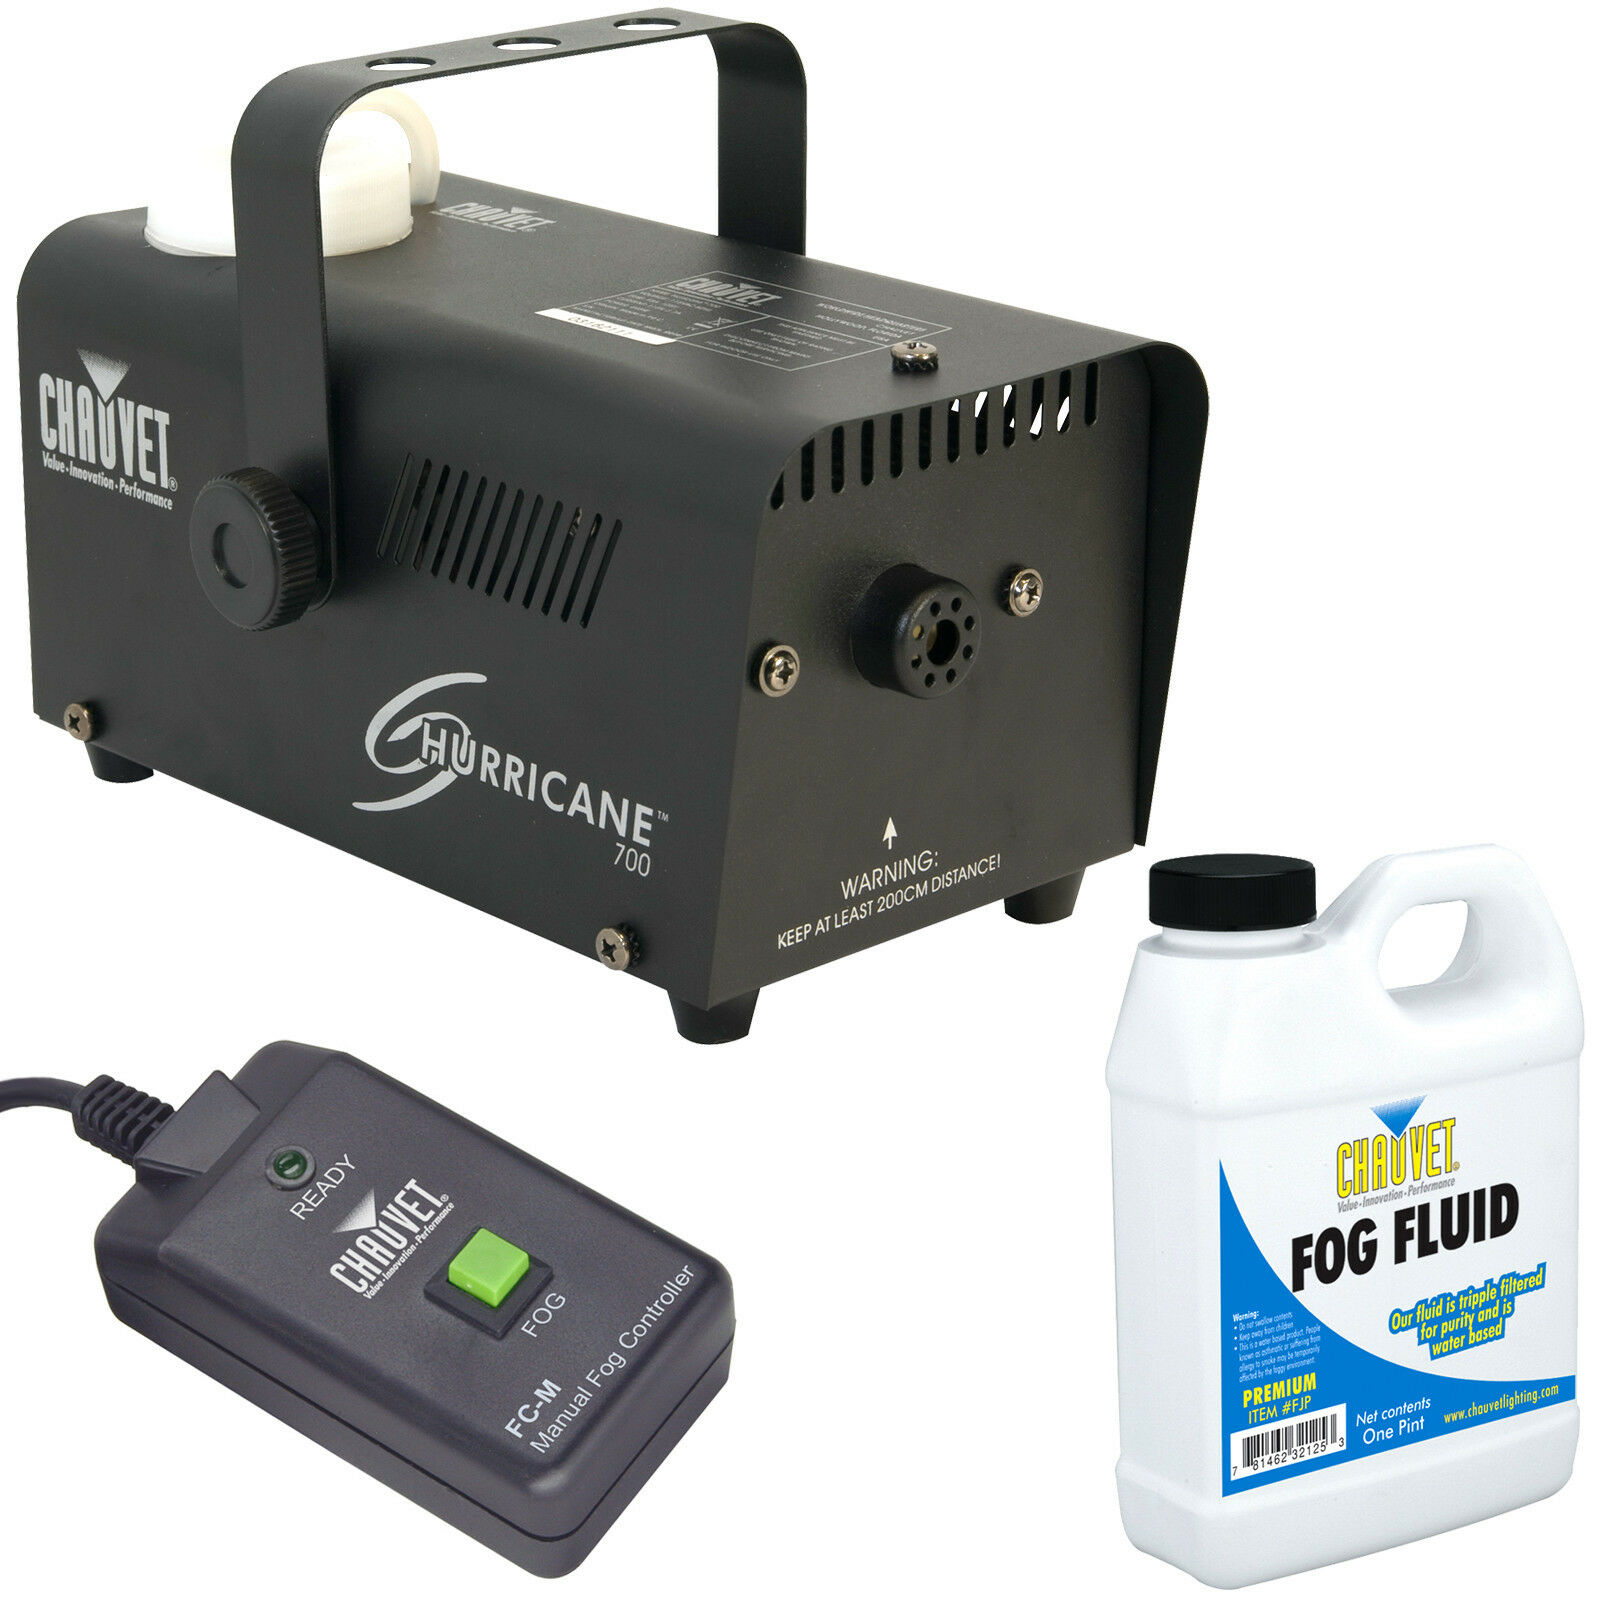 Chauvet H-700 Hurricane 700 Halloween Fog/Smoke Machine with Fluid & Remote